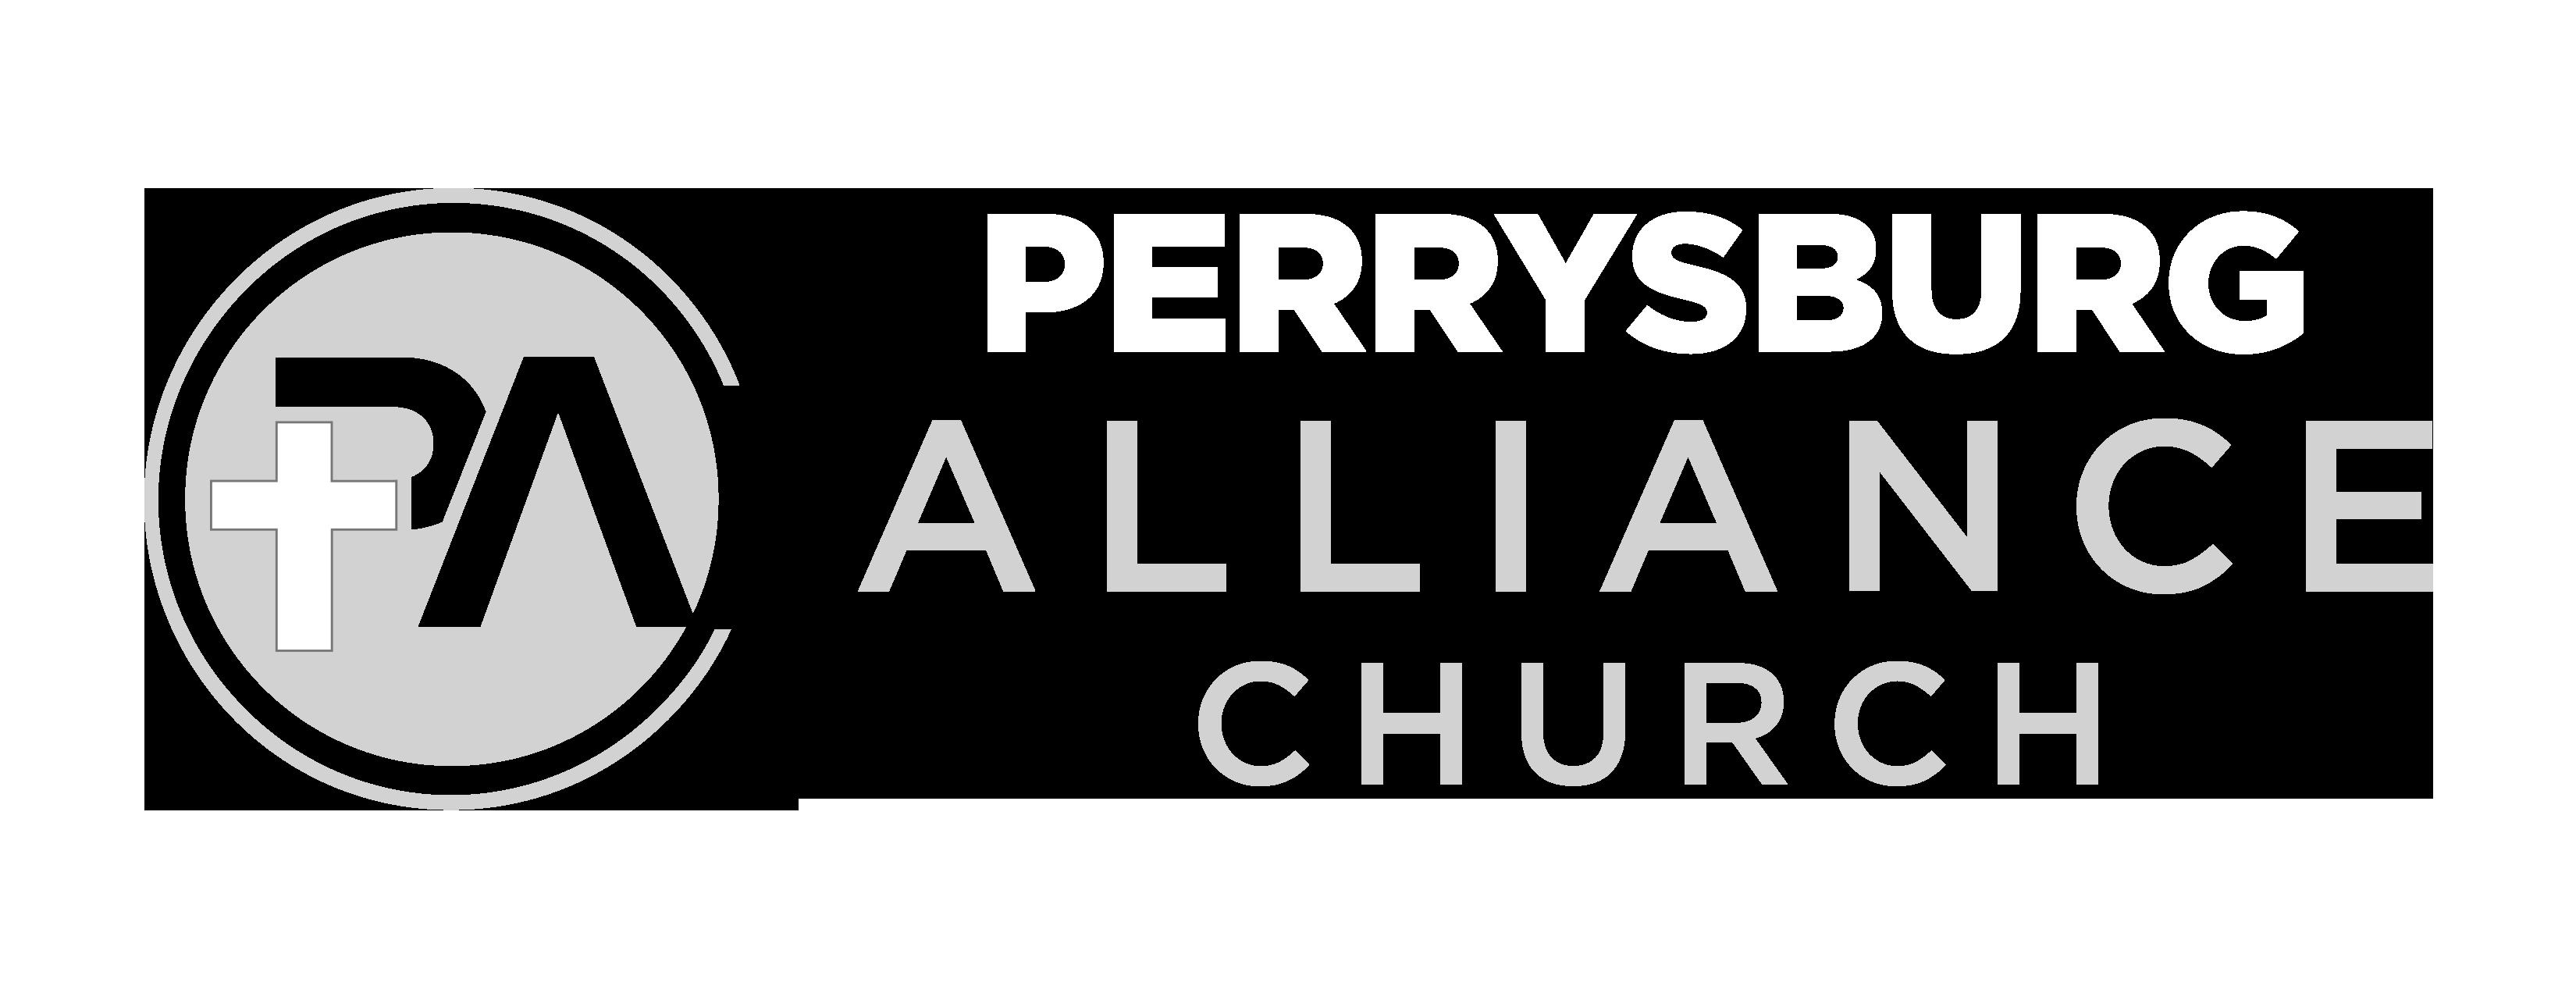 Perrysburg Alliance Church